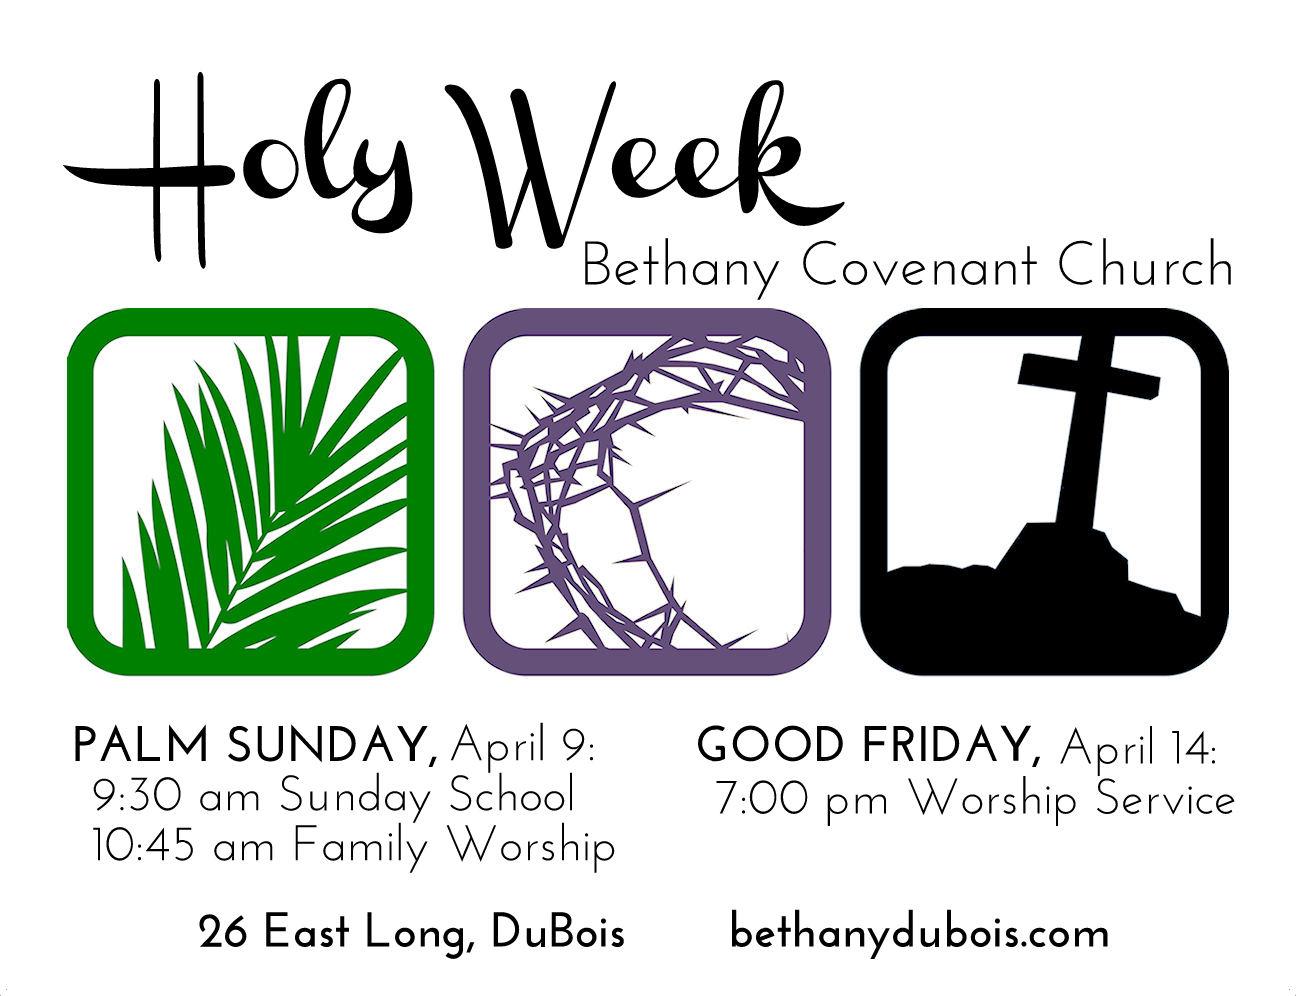 holyweek main.jpg